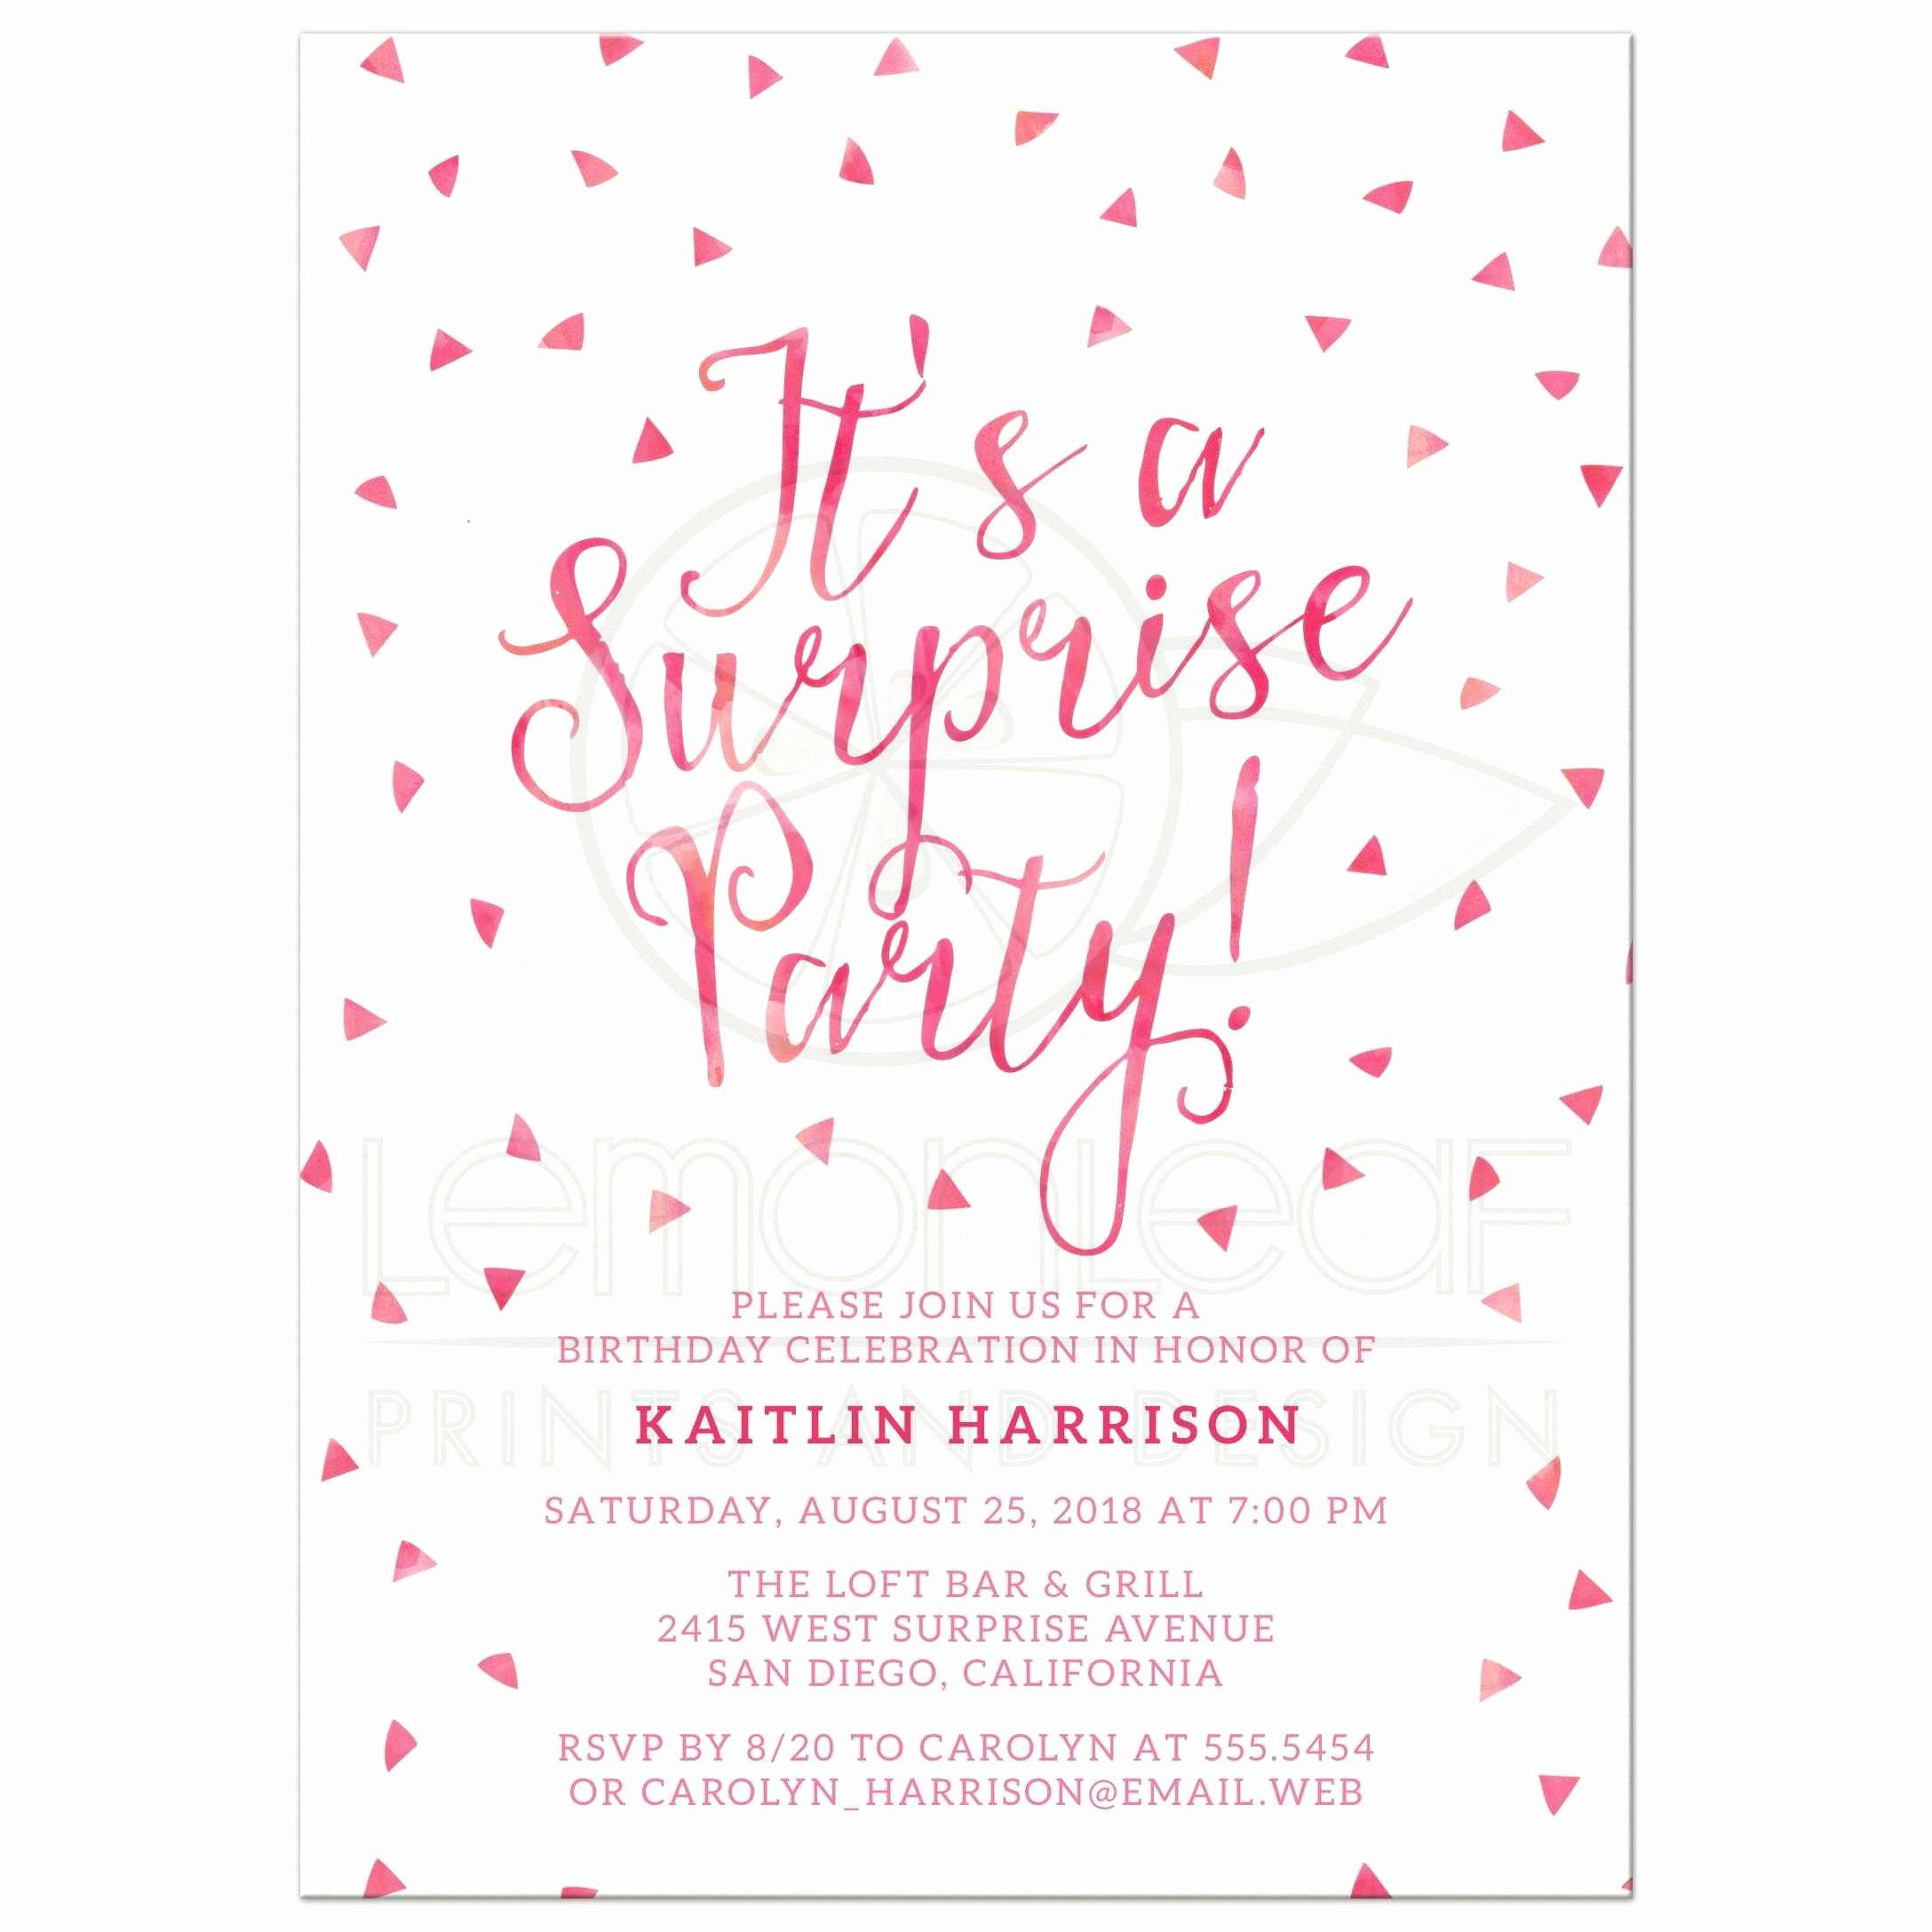 surprise birthday party invitations pink watercolor triangle confetti